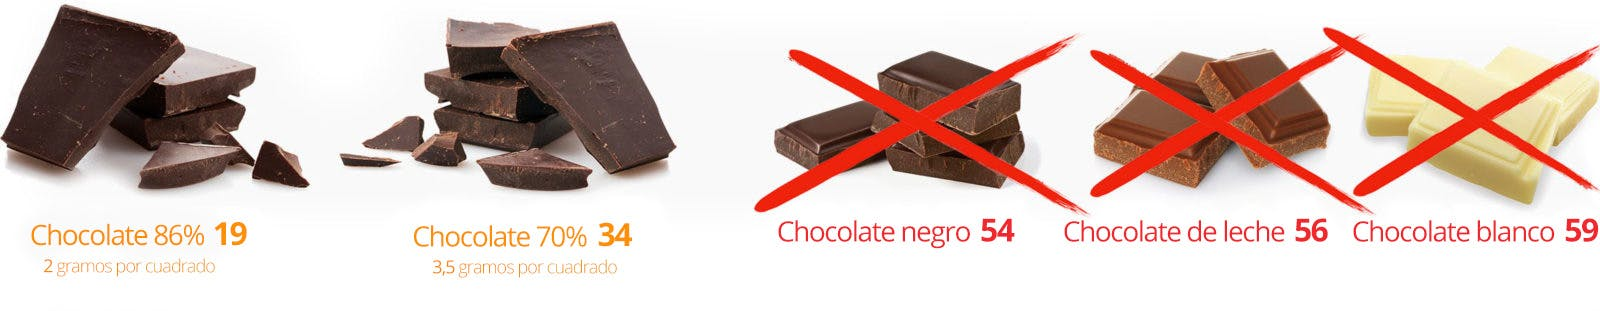 Keto–Chocolate-1_es